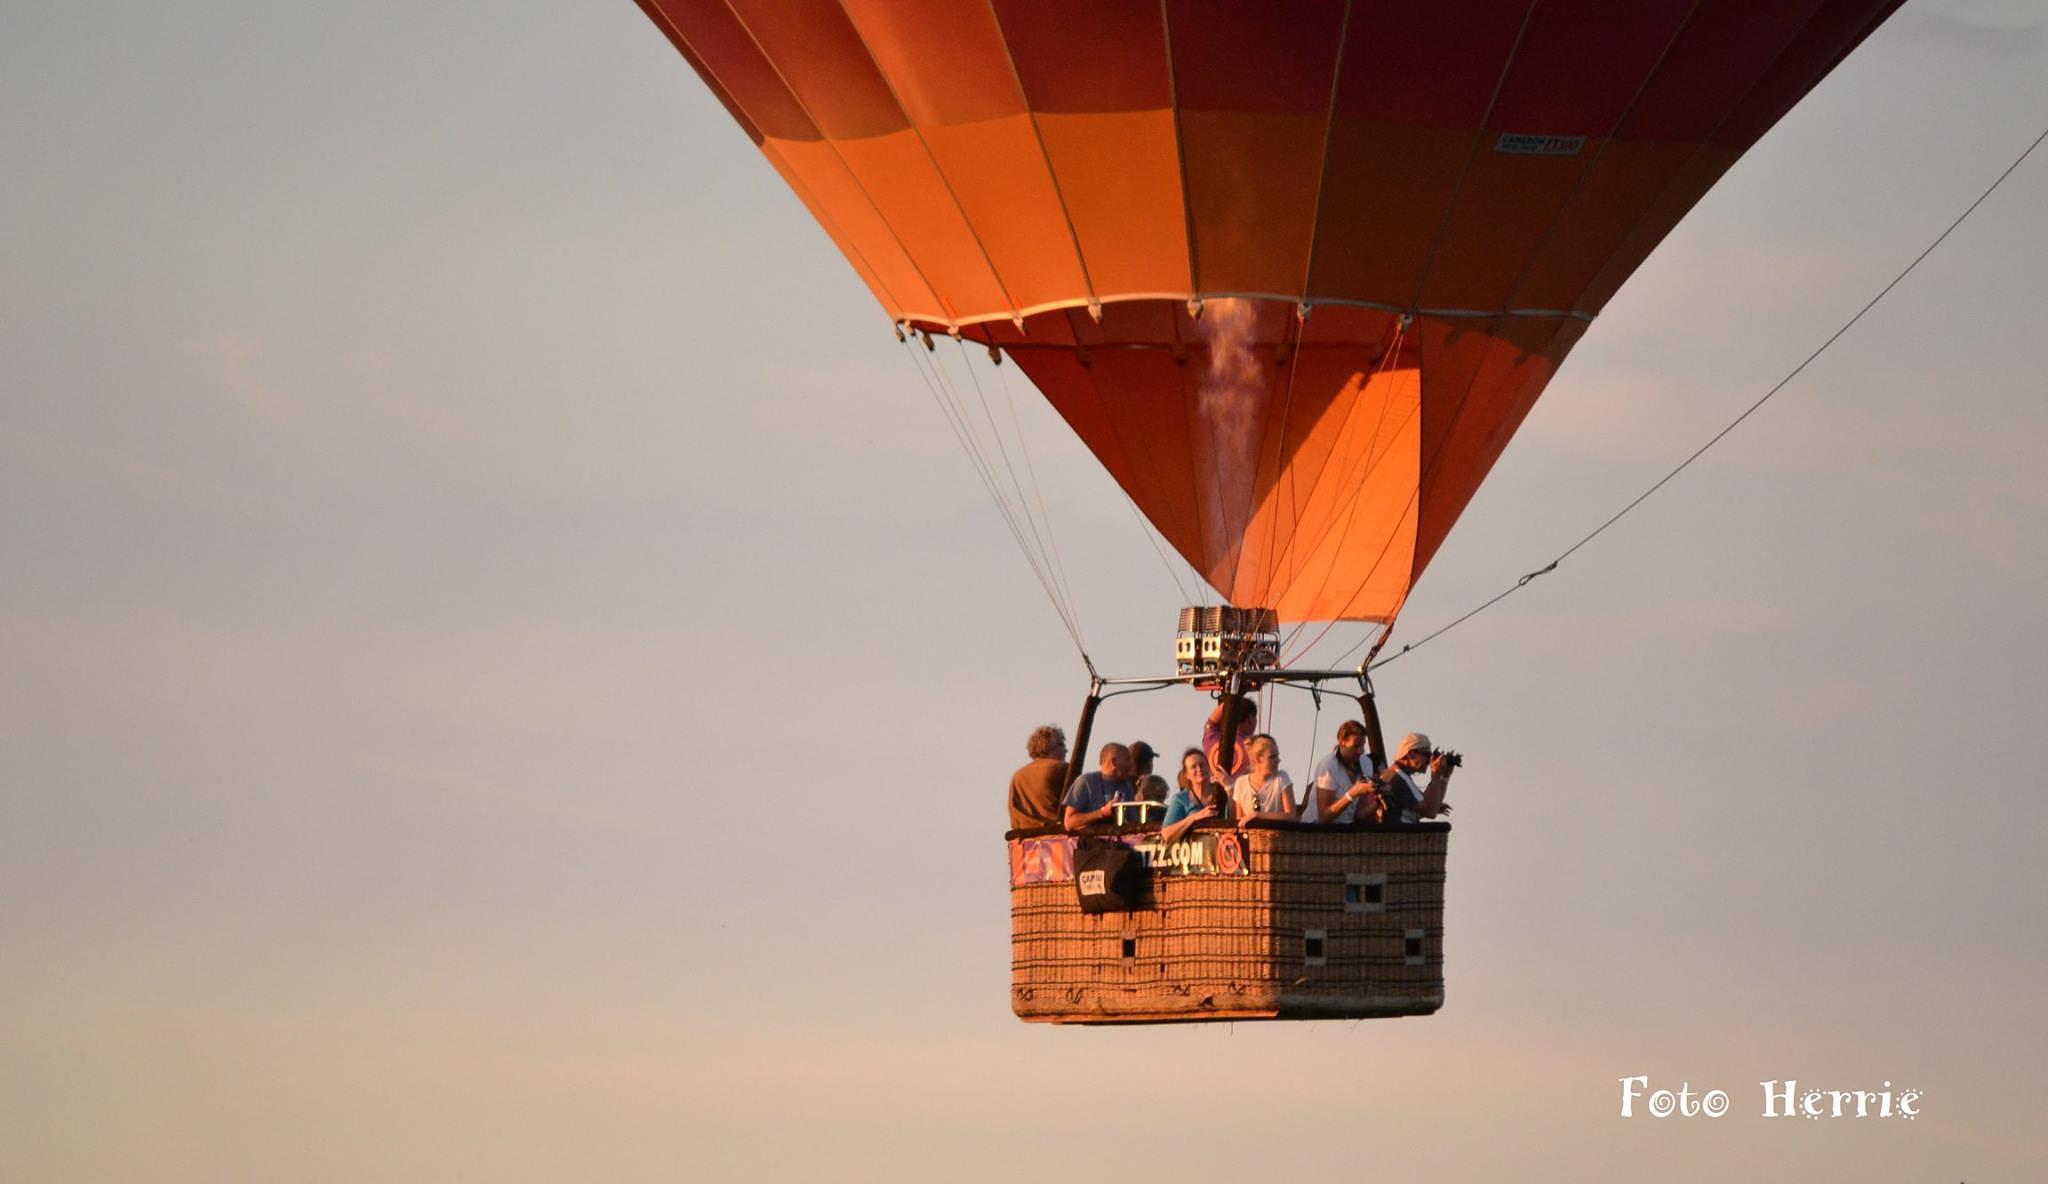 Hot air balloon ride 1 by photoherrieschnoink